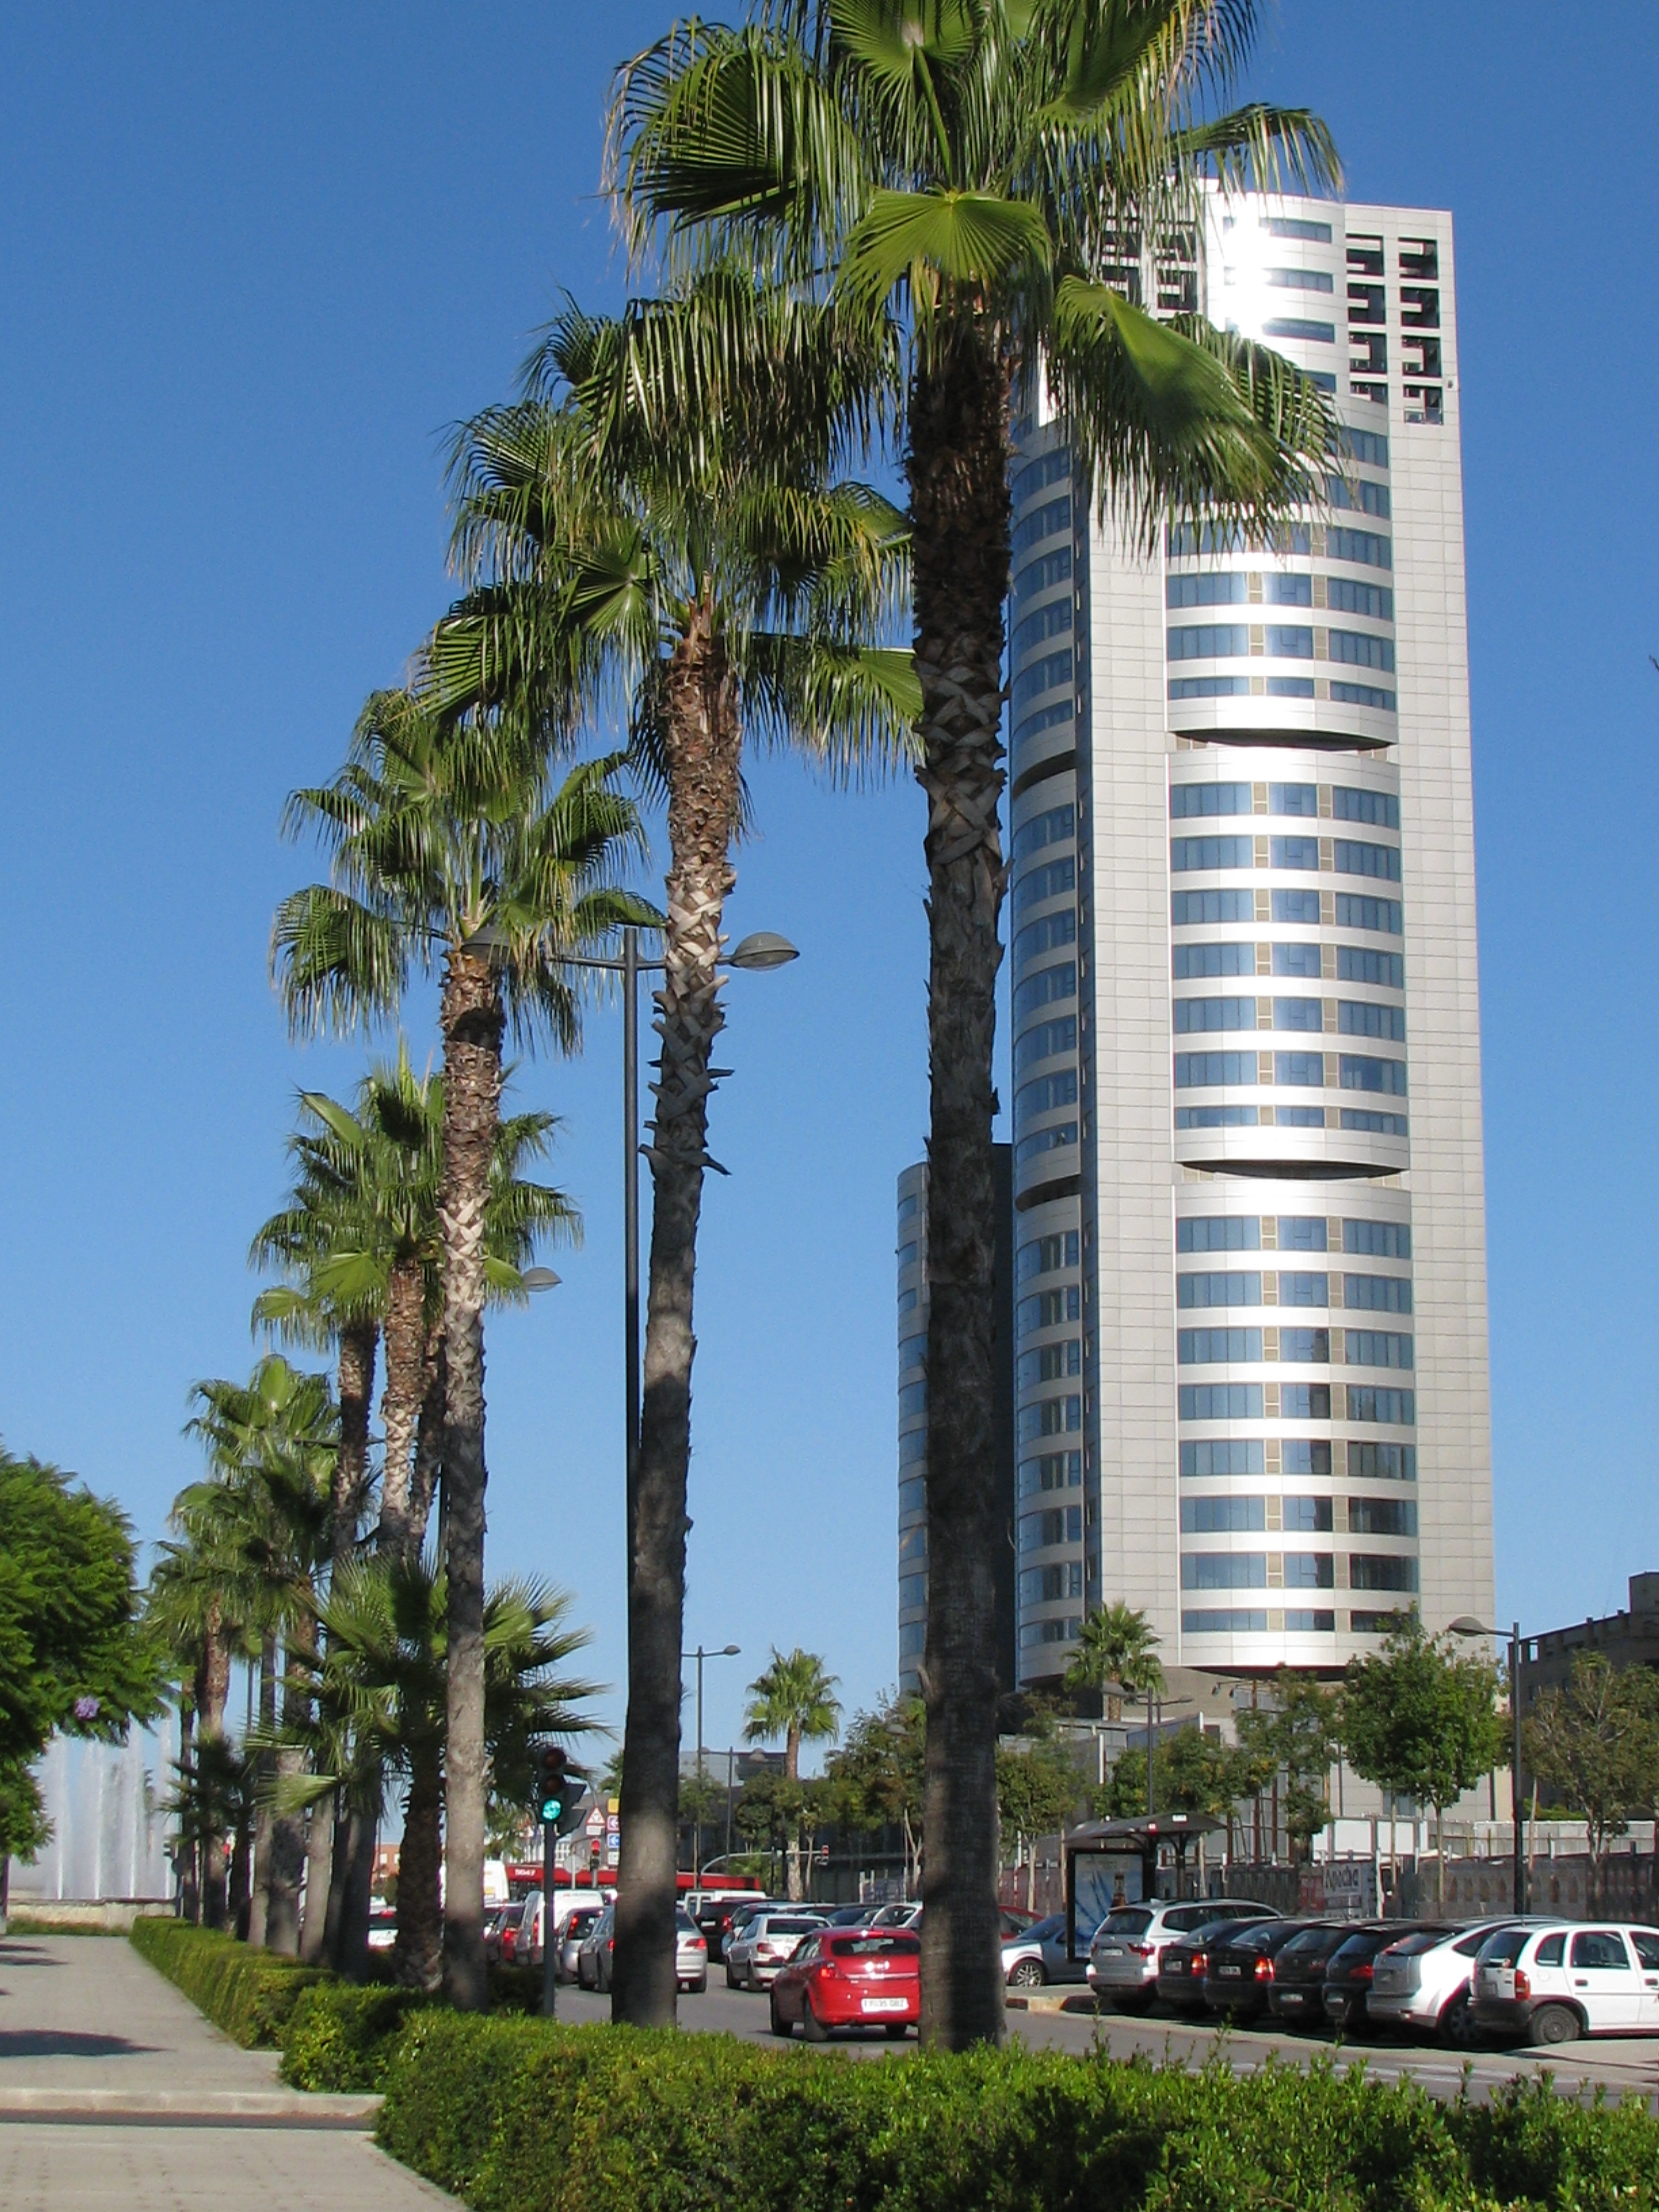 Hotels In Hilton Head Island Sc On The Beach